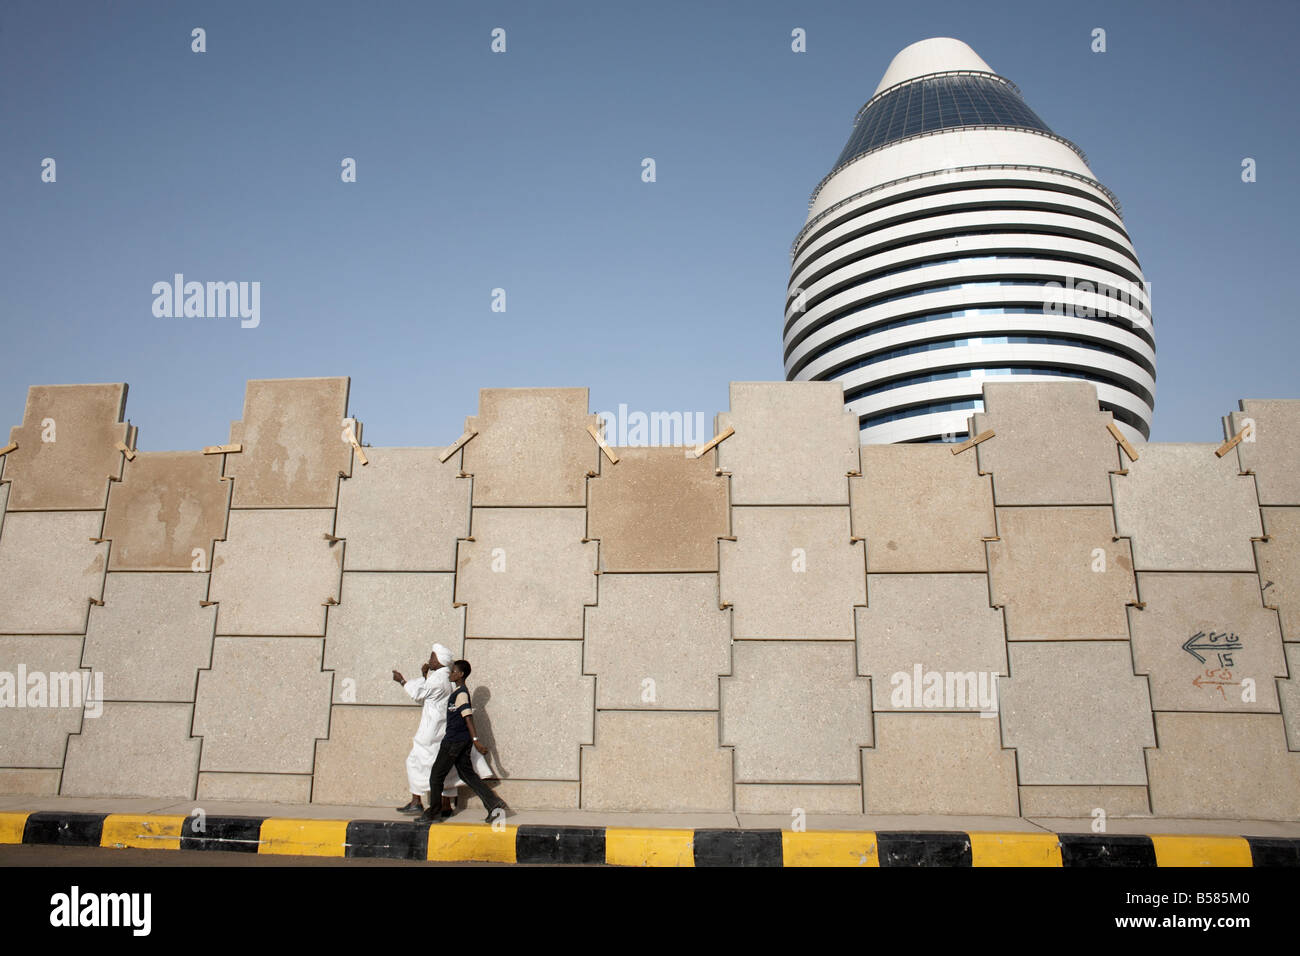 The 5-star Boji Al-Fateh Hotel, or Libyan Hotel, Khartoum, Sudan, Africa - Stock Image